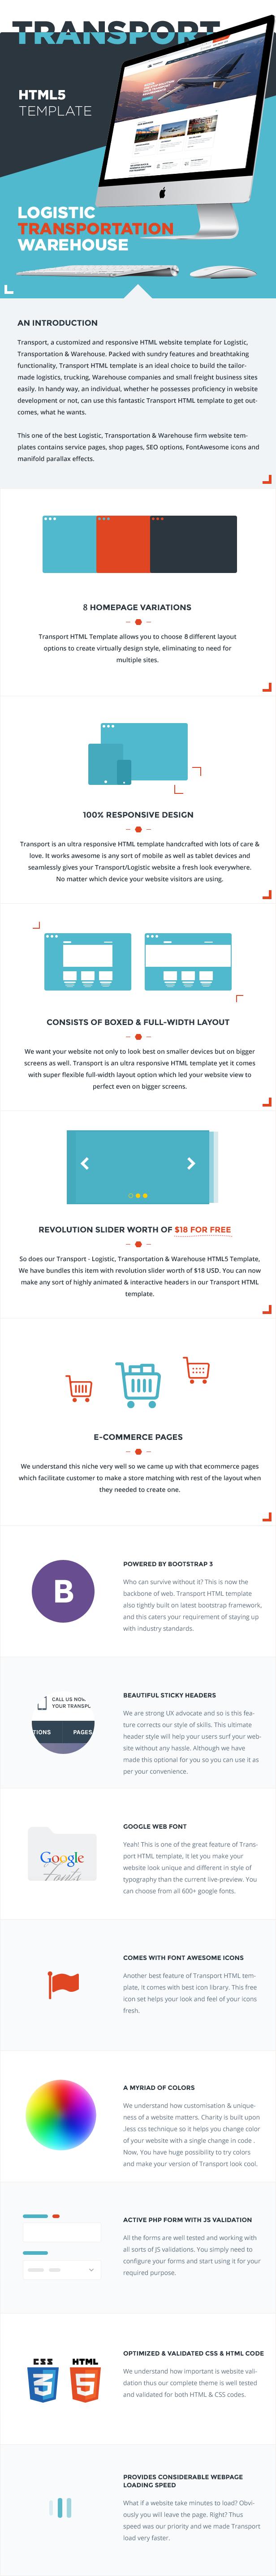 Transport - Logistic, Transportation & Warehouse HTML5 Template - 1